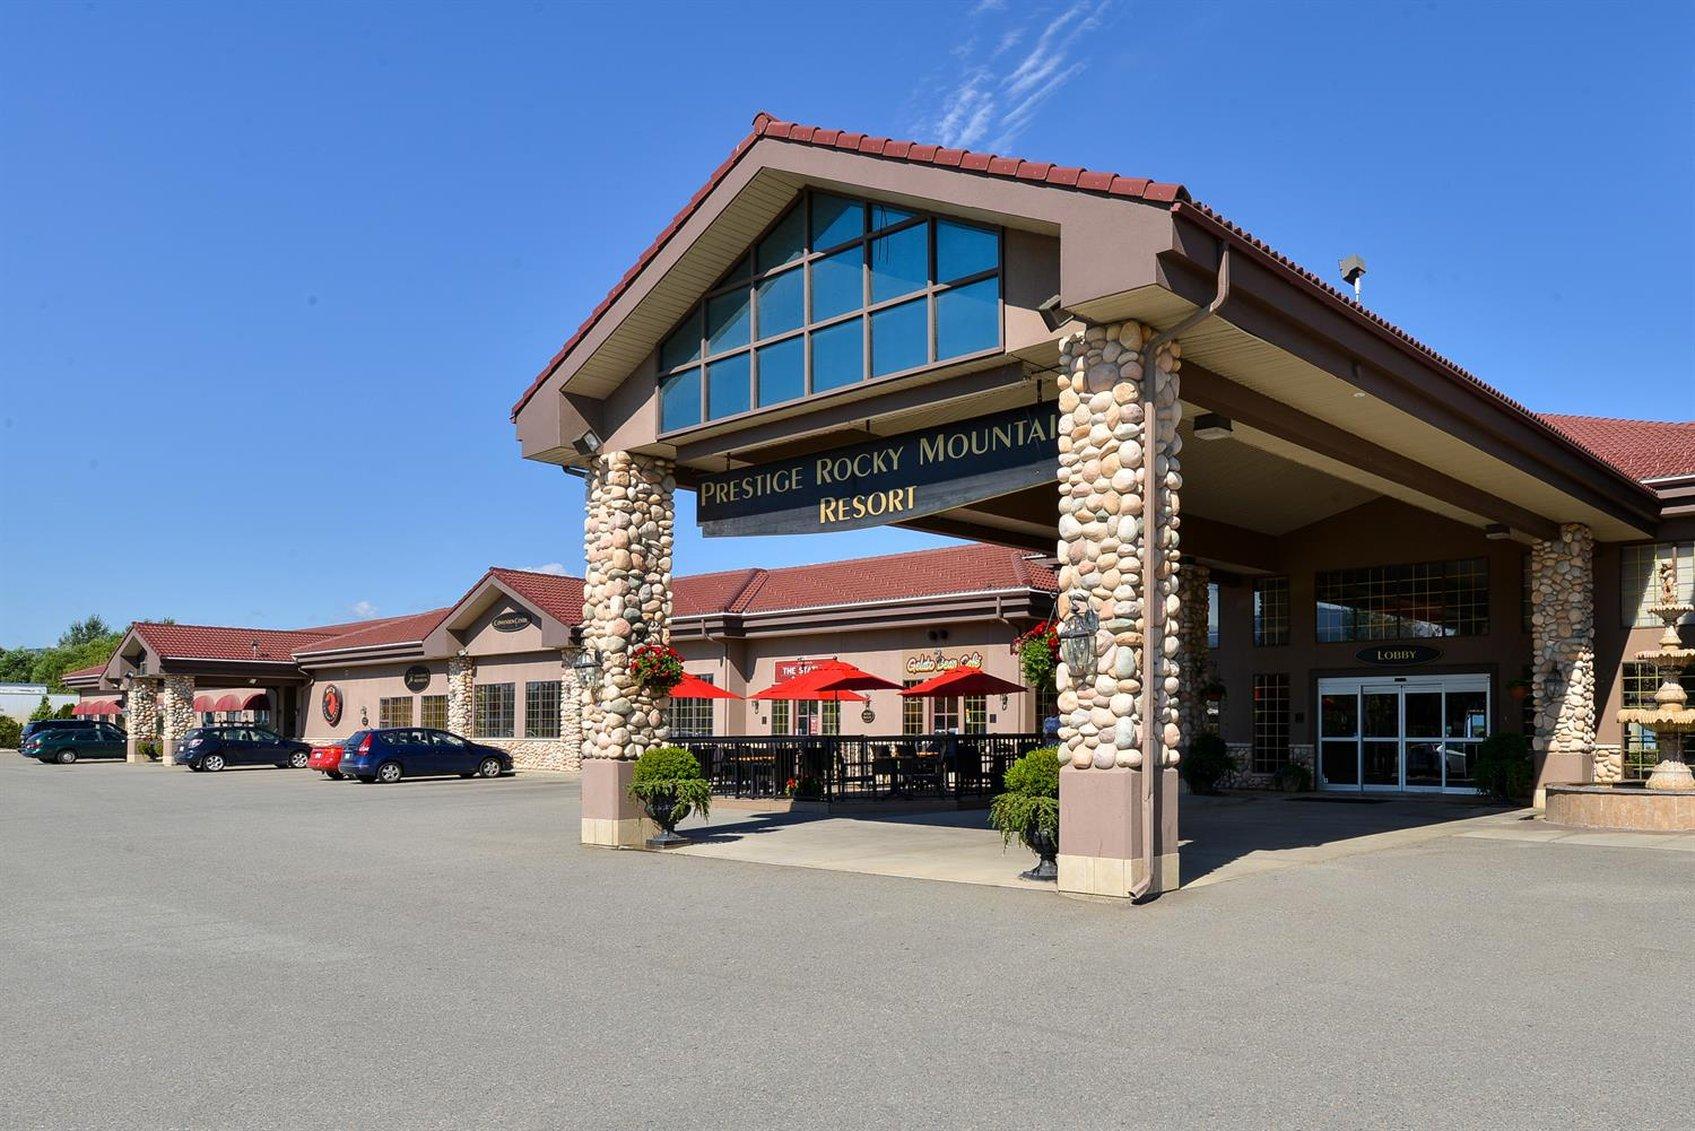 The Prestige Rocky Mountain Resort